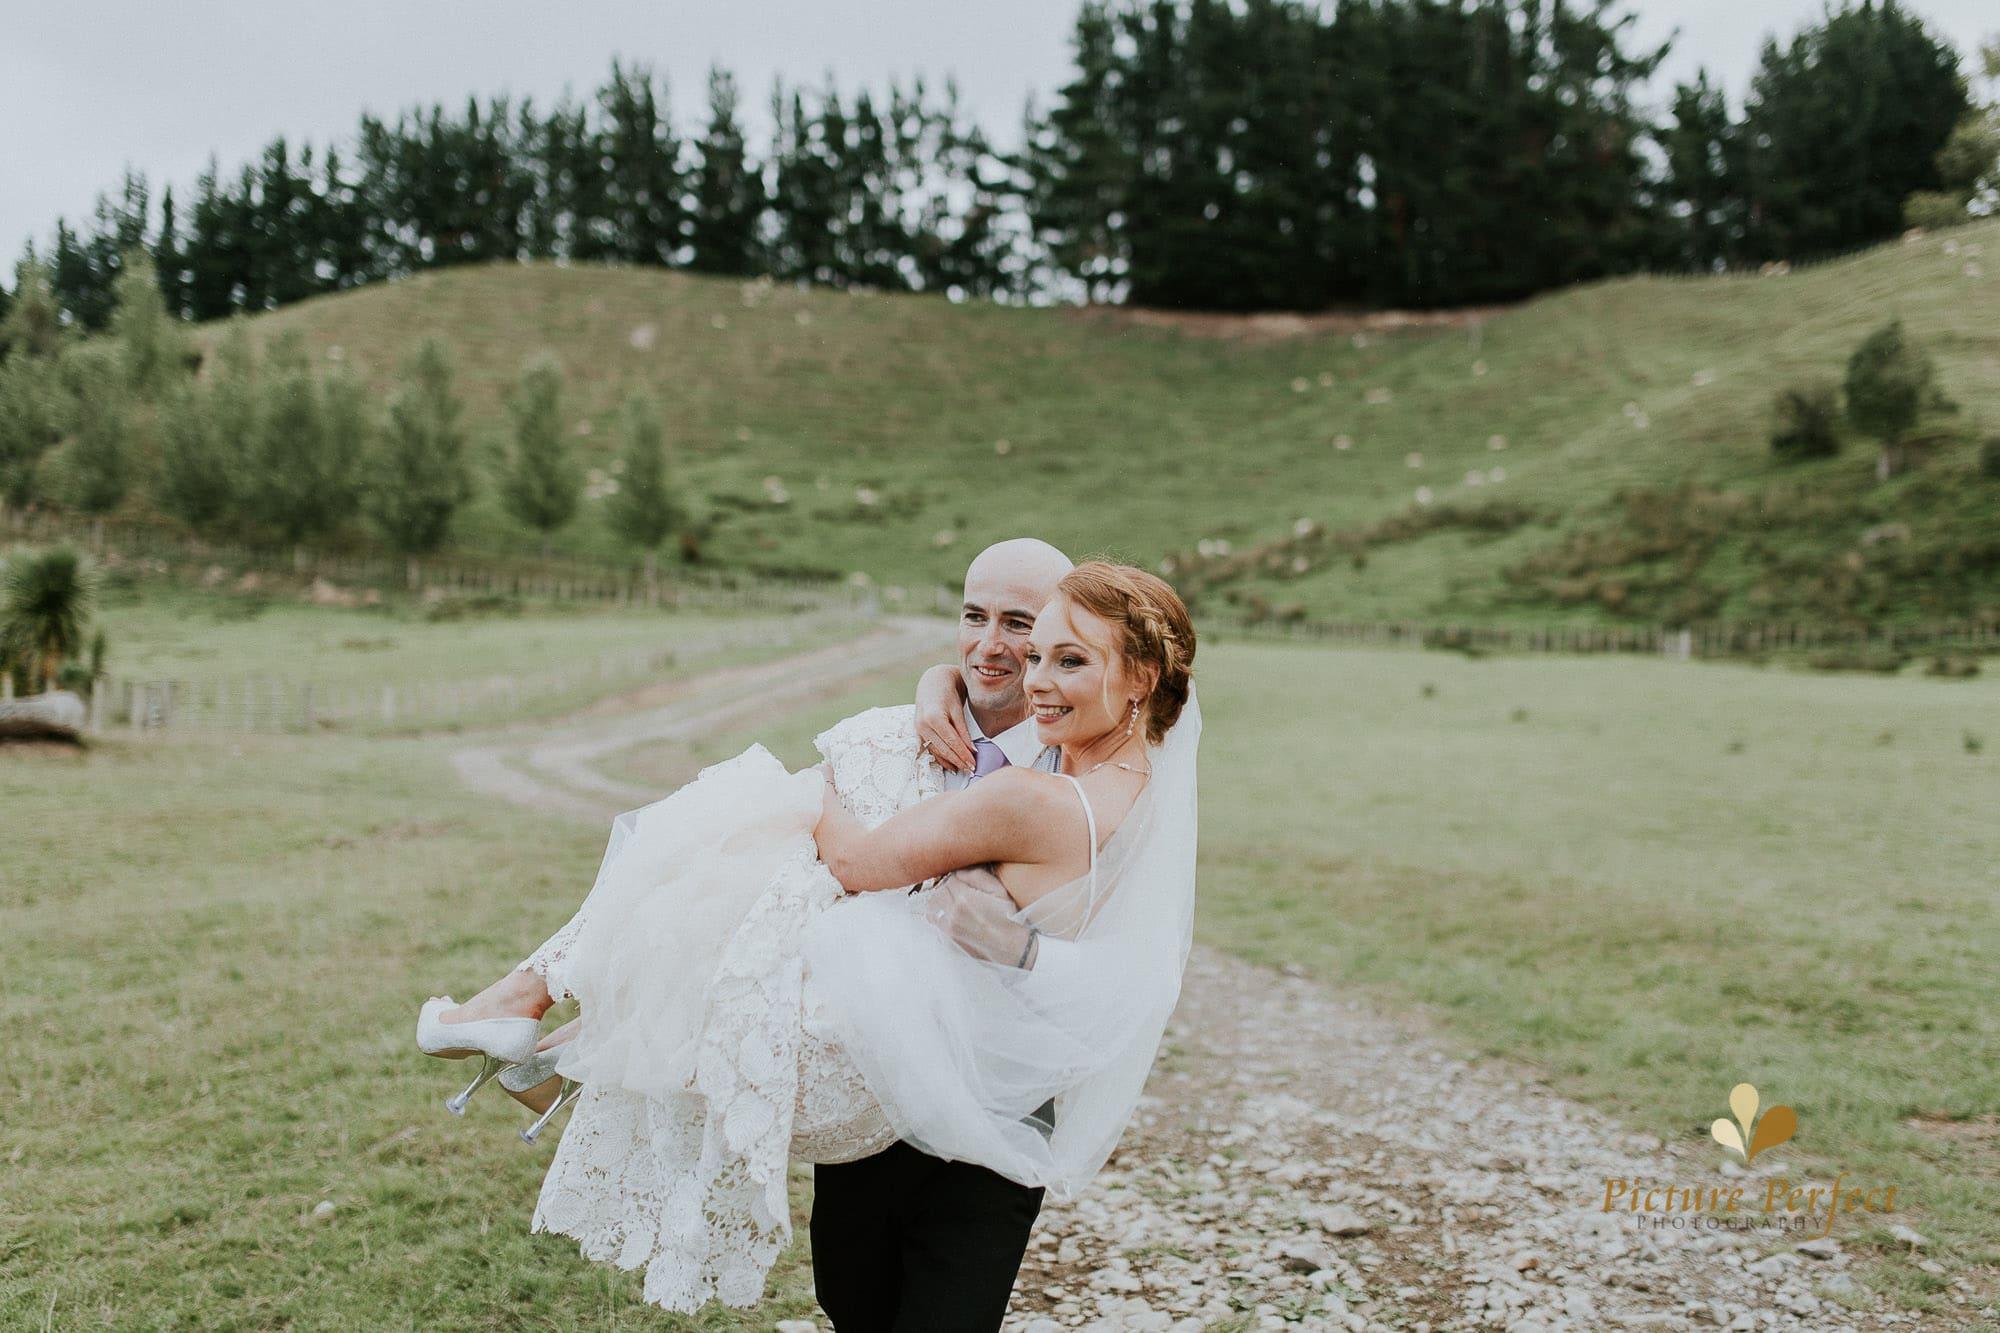 Freya and Matt fun wedding photography 0280